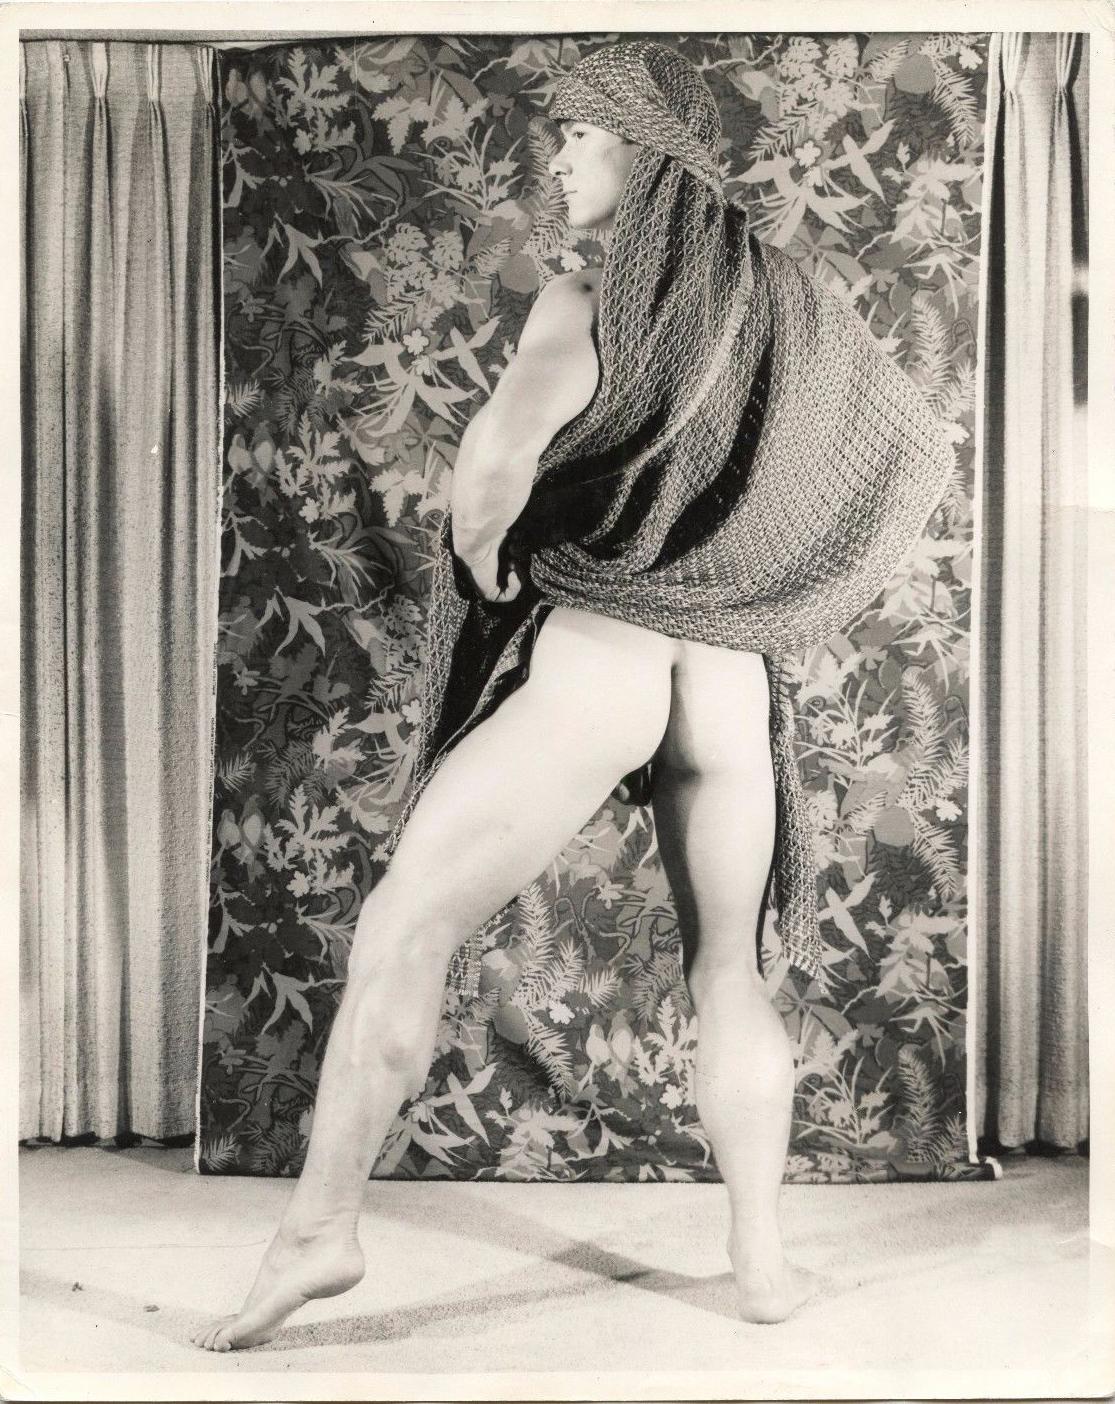 Male Models Vintage Beefcake-5283